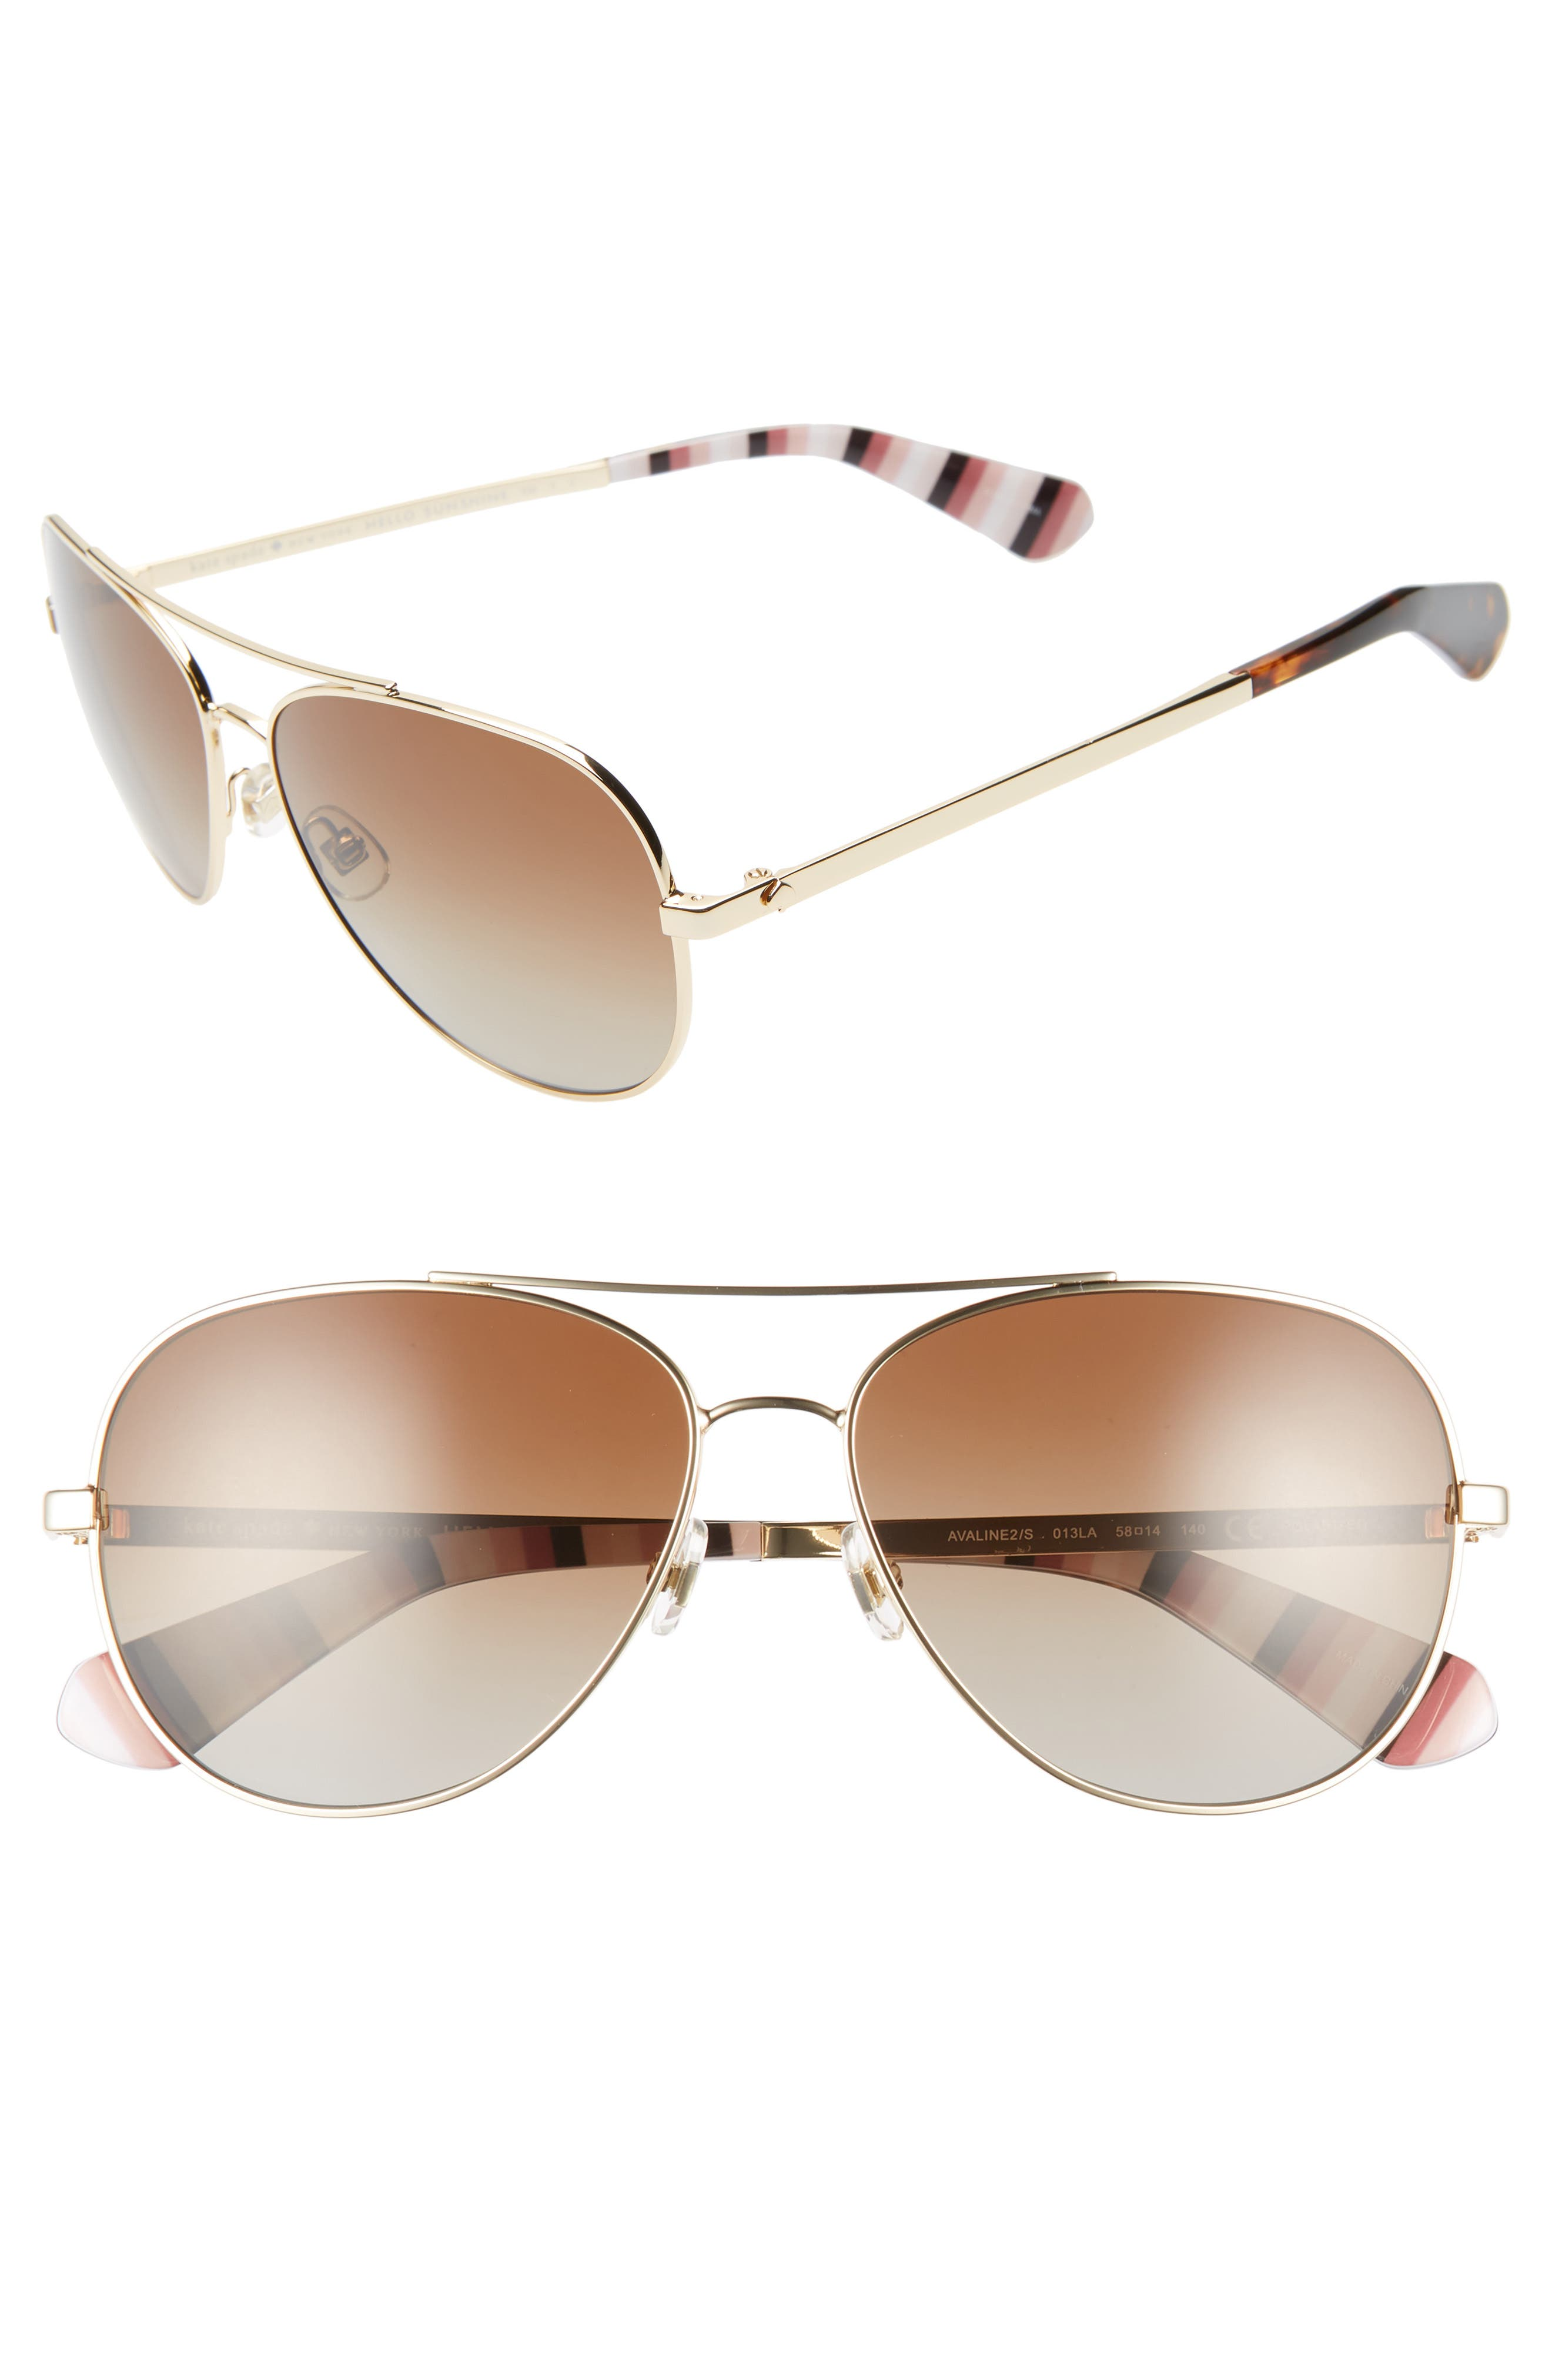 KATE SPADE NEW YORK avaline 2 58mm polarized aviator sunglasses, Main, color, GOLD